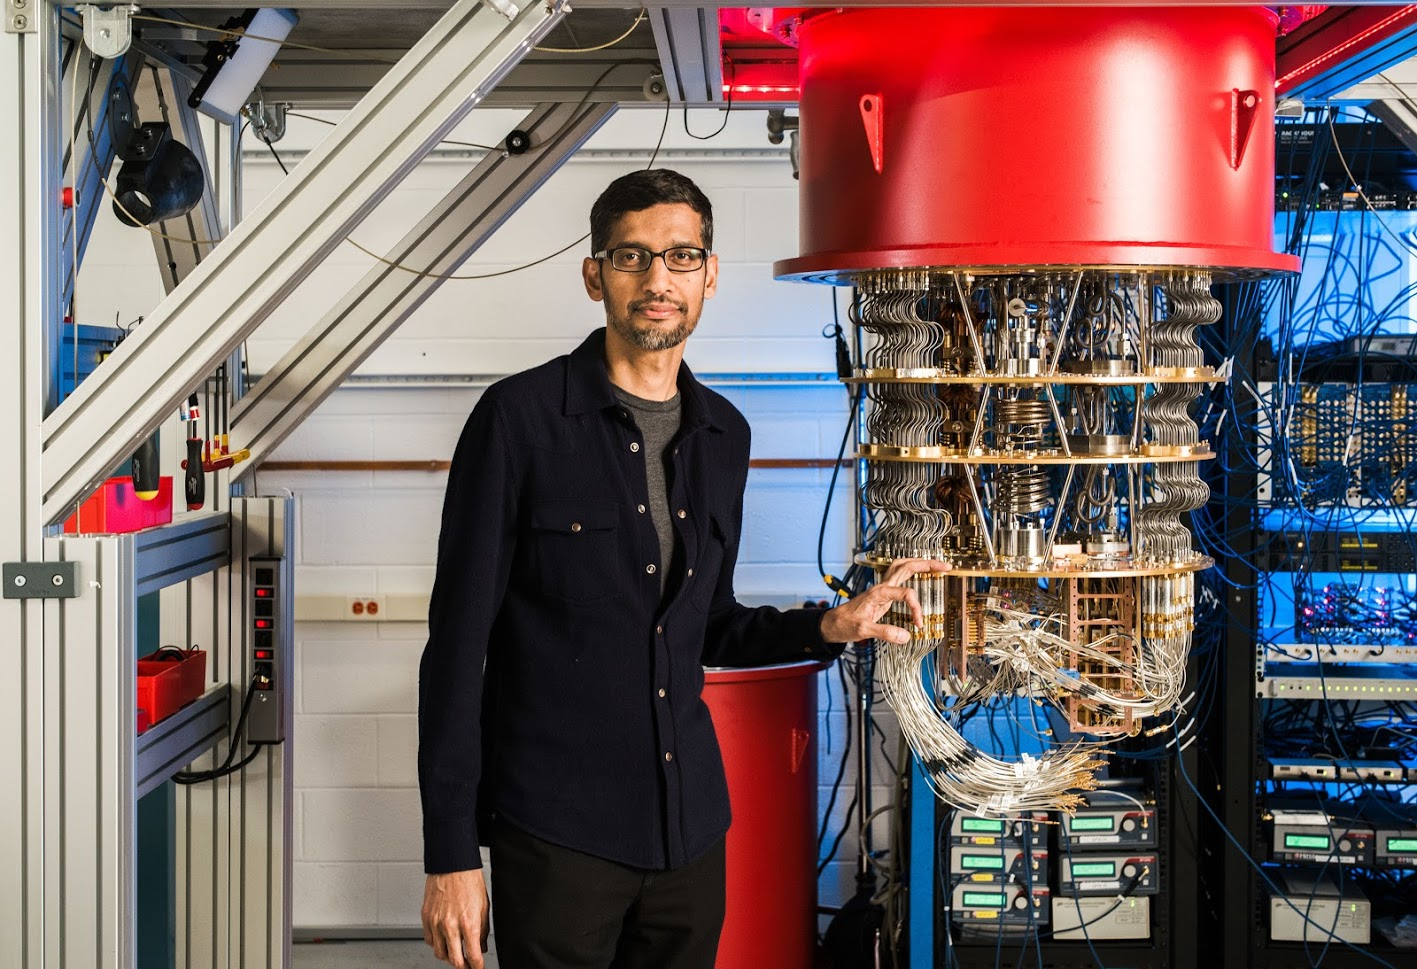 Sundar Pichai AI Google CEO